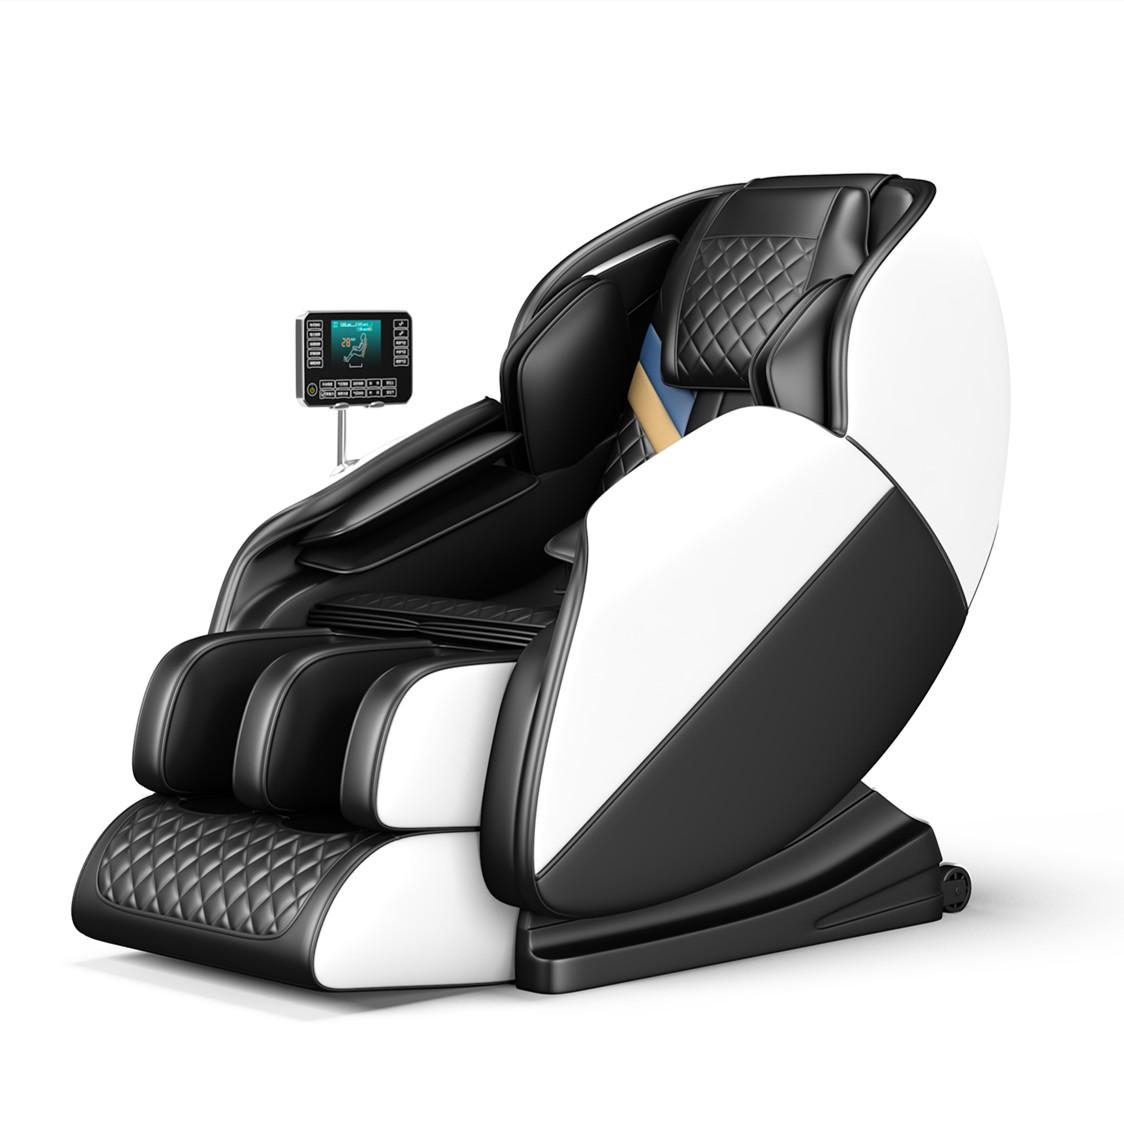 K12SL Luxury 3D Massage Chair For Sale in 2021